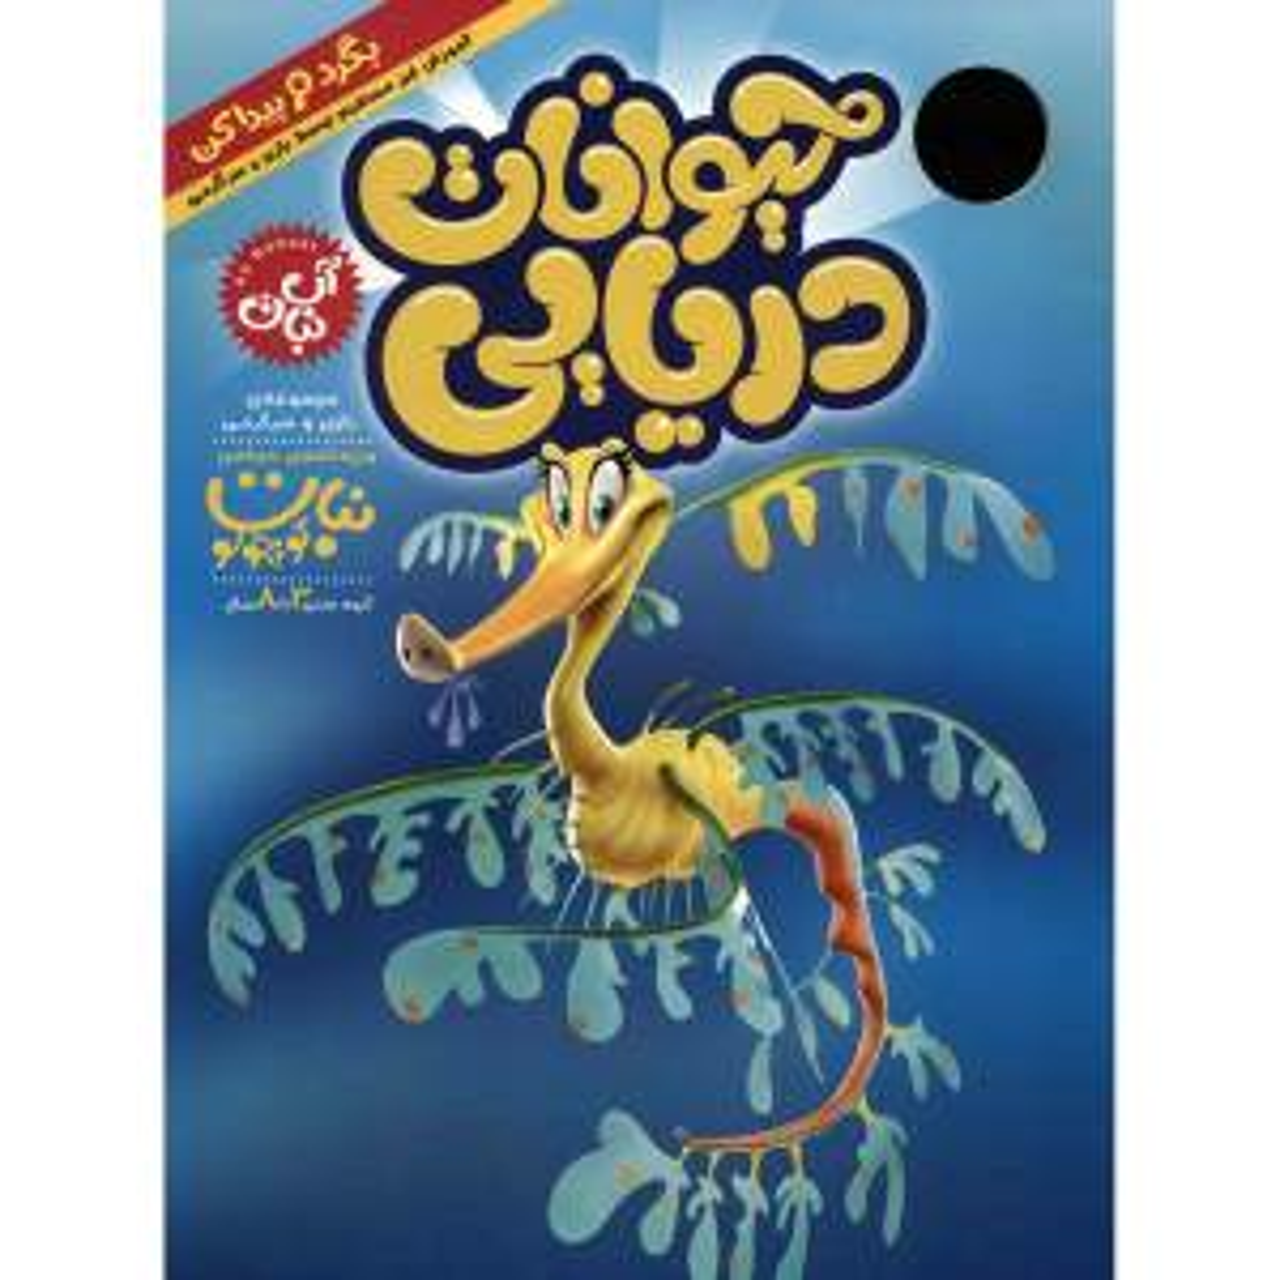 ویژه نامه ی مجله ی نبات کوچولو - حیوانات دریایی